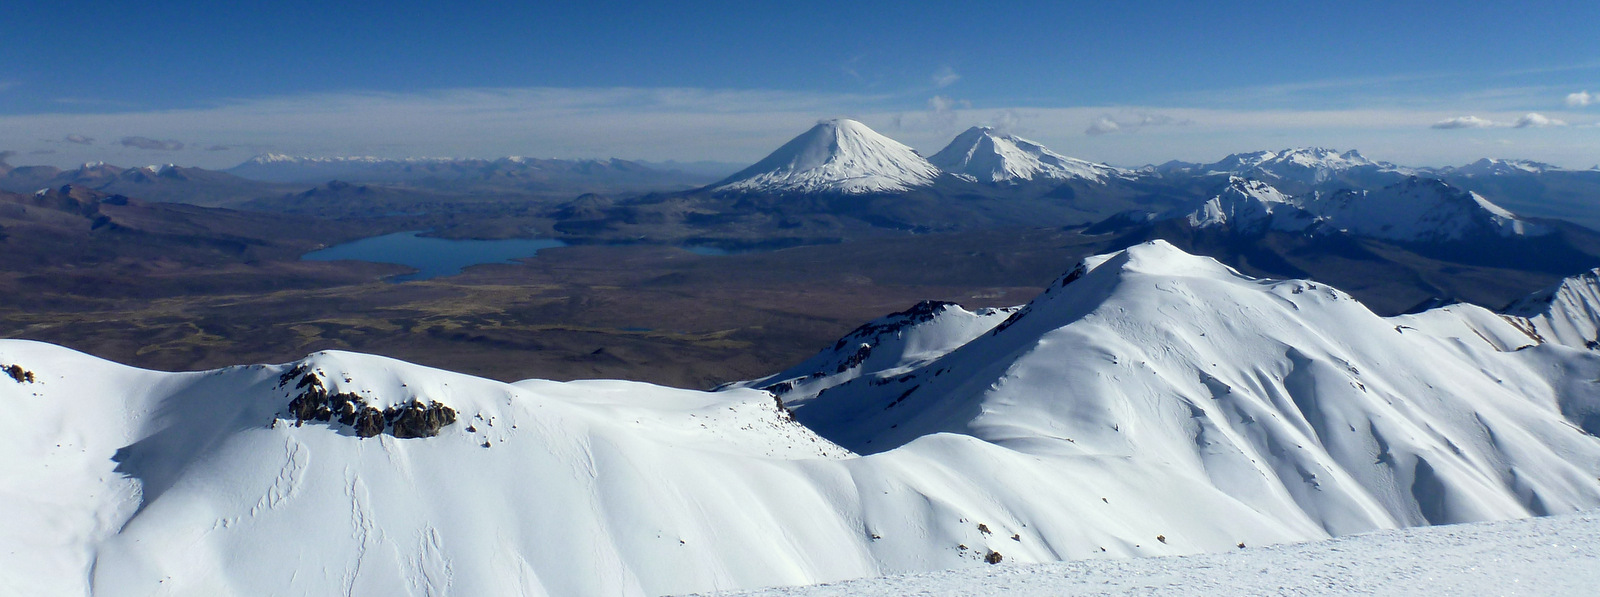 the twins seen from Acotango volcano